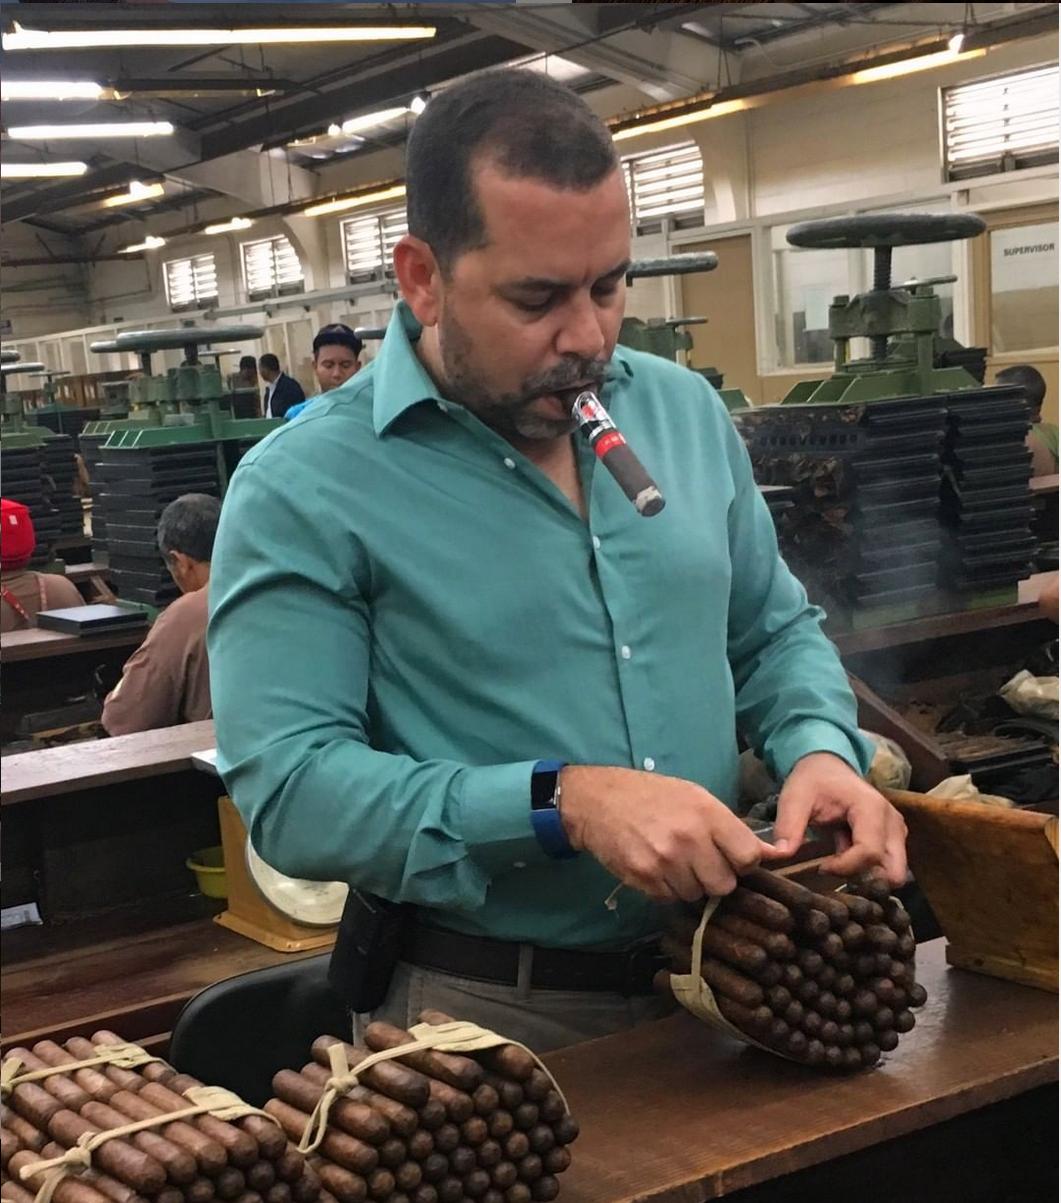 Yuri Guillen, Operations Manager of La Gloria Cubana Cigars Smokes a Cigar While Inspecting a Bundle